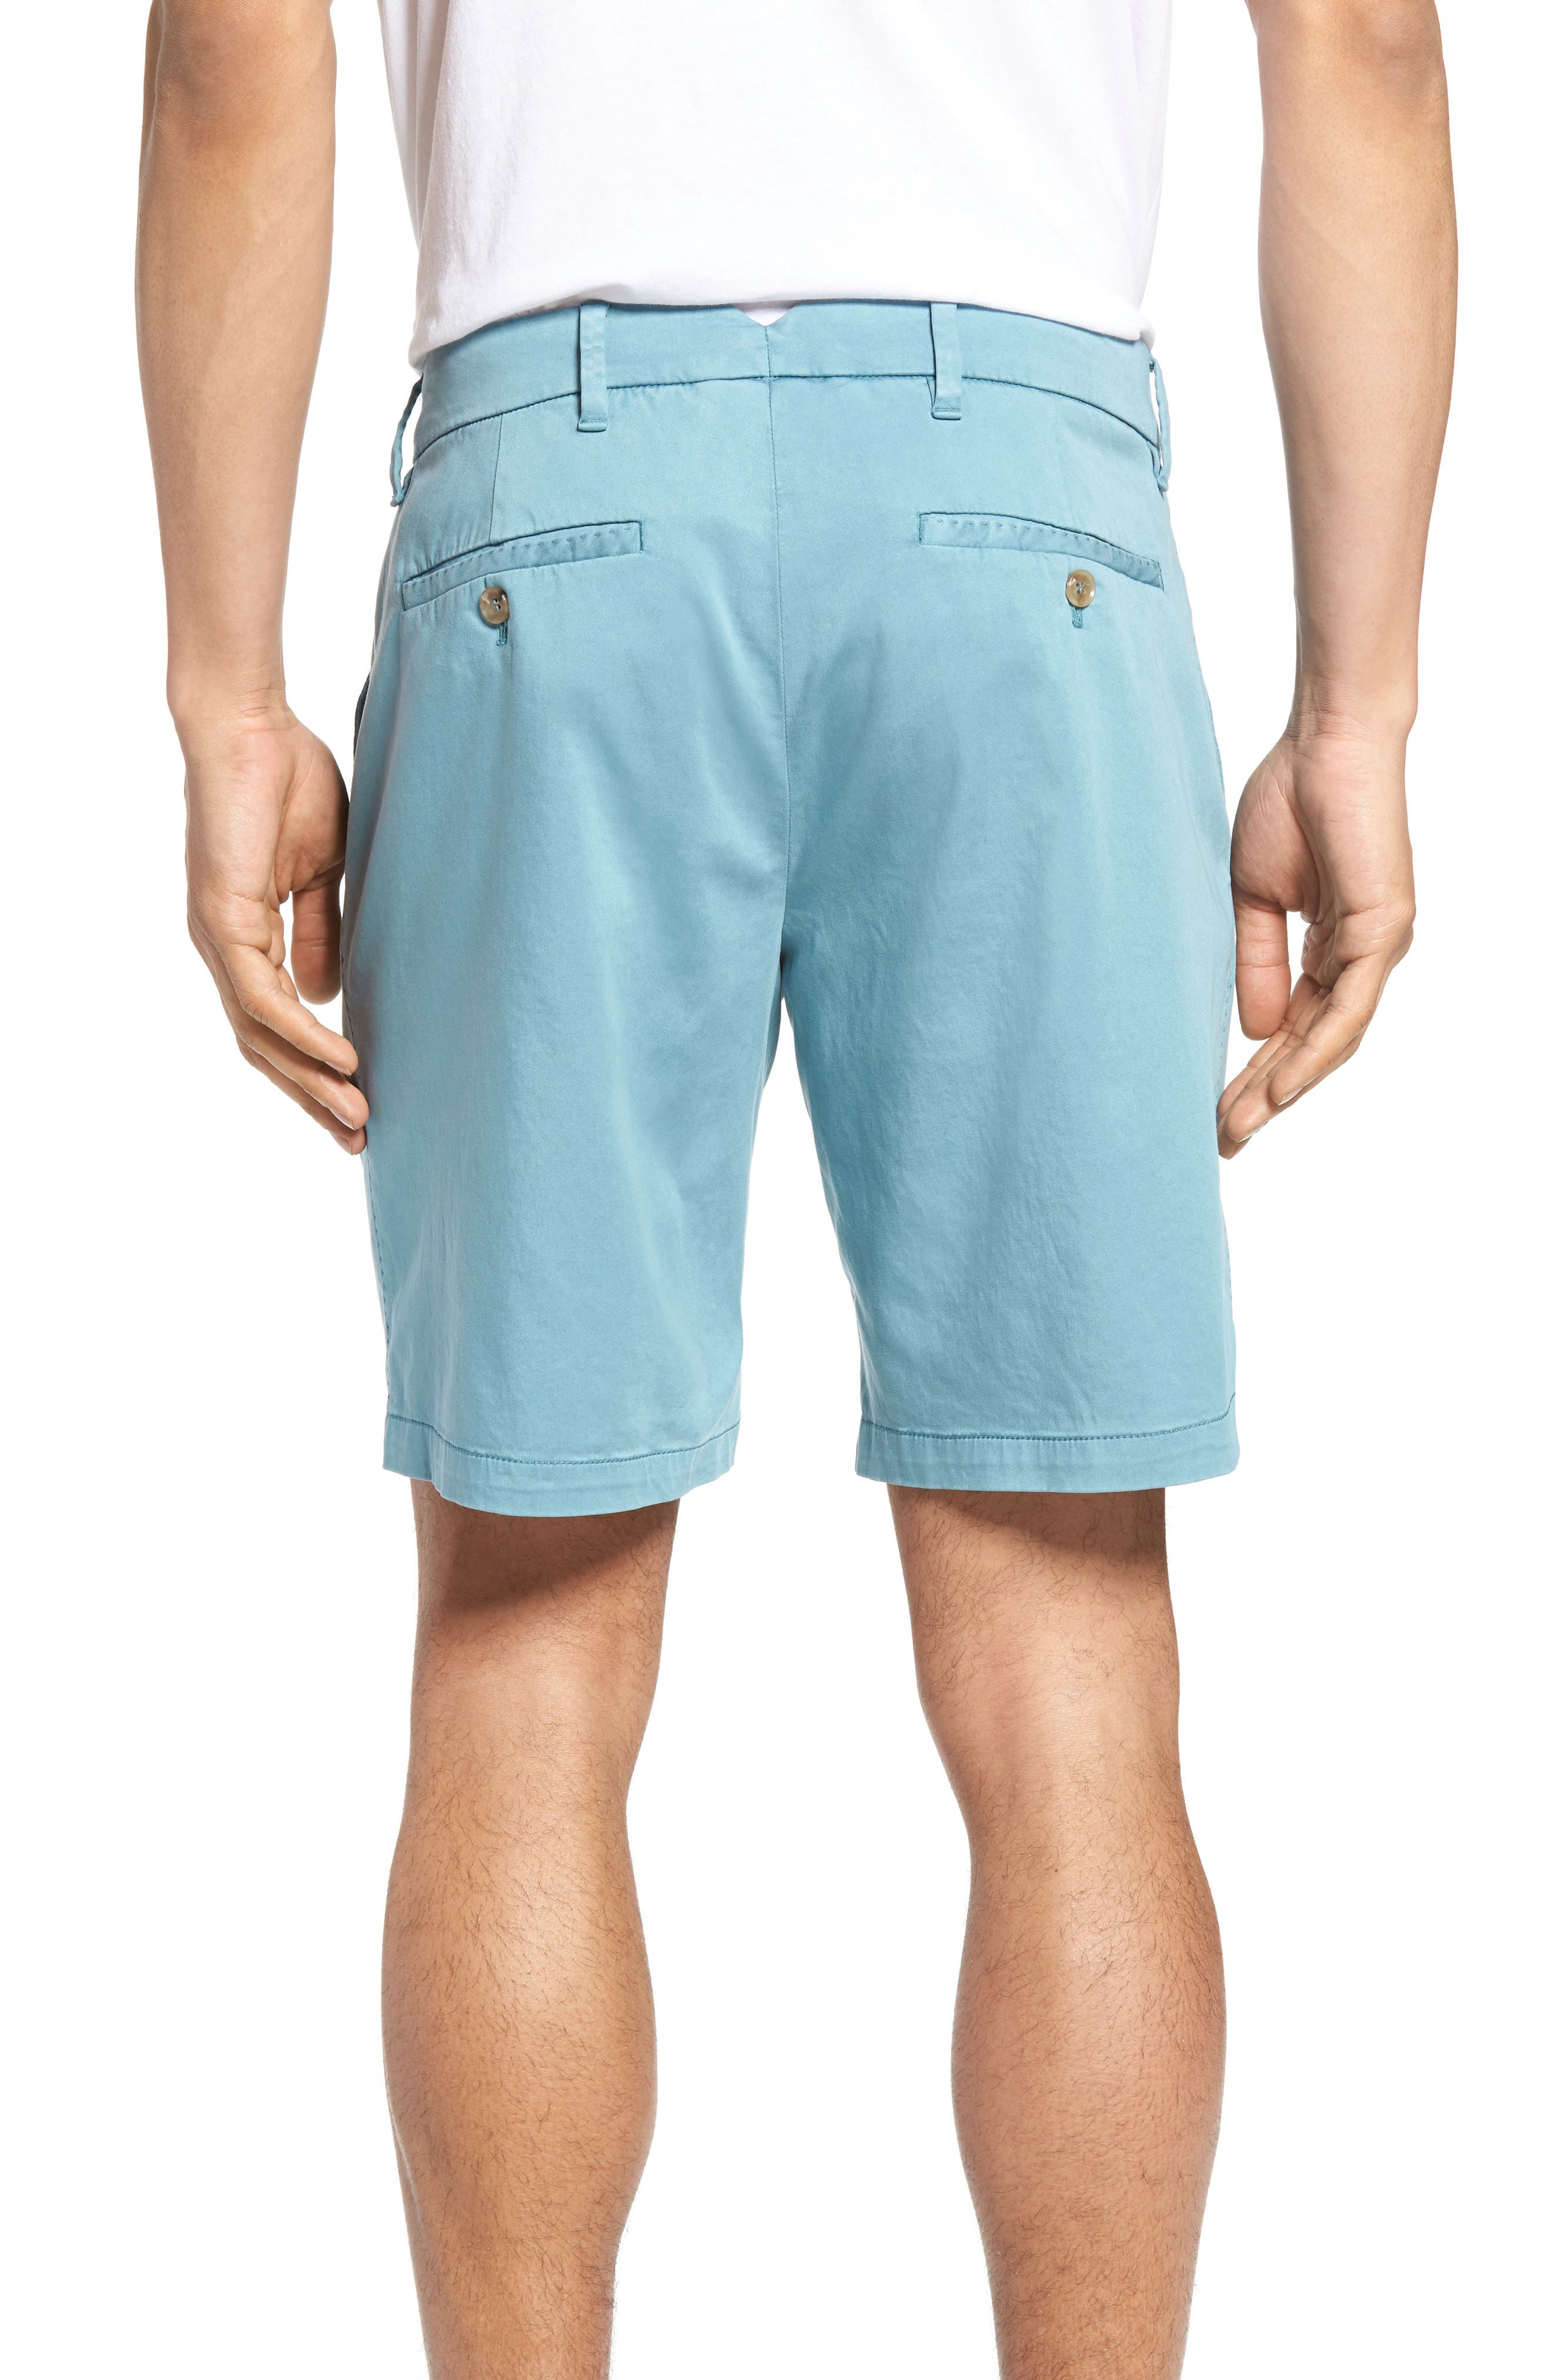 Catalpa Shorts,                             Alternate thumbnail 2, color,                             Teal